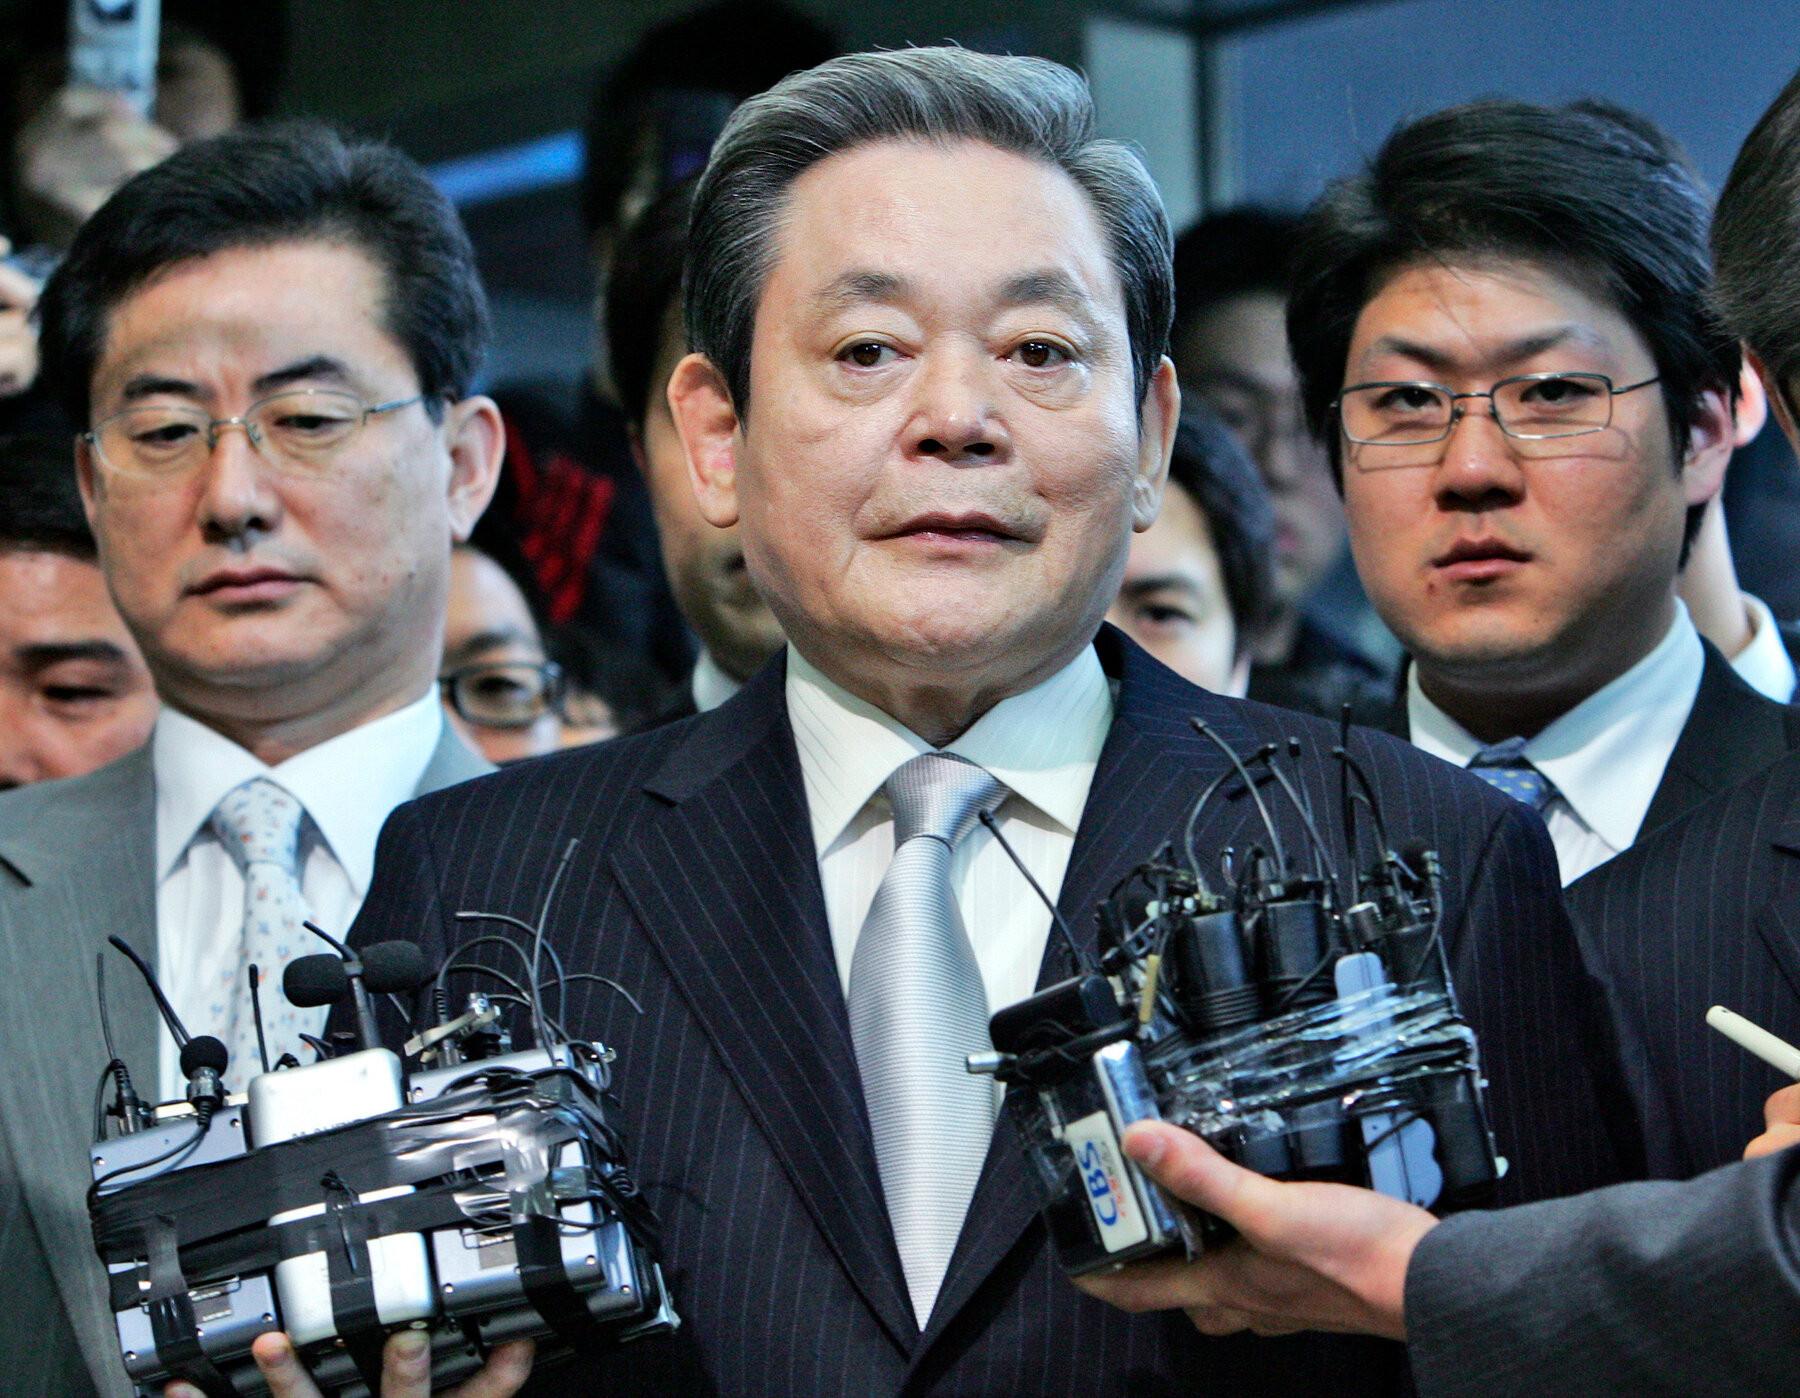 Samsung electronics chairman, Lee Kun-Hee dies at 78 lindaikejisblog